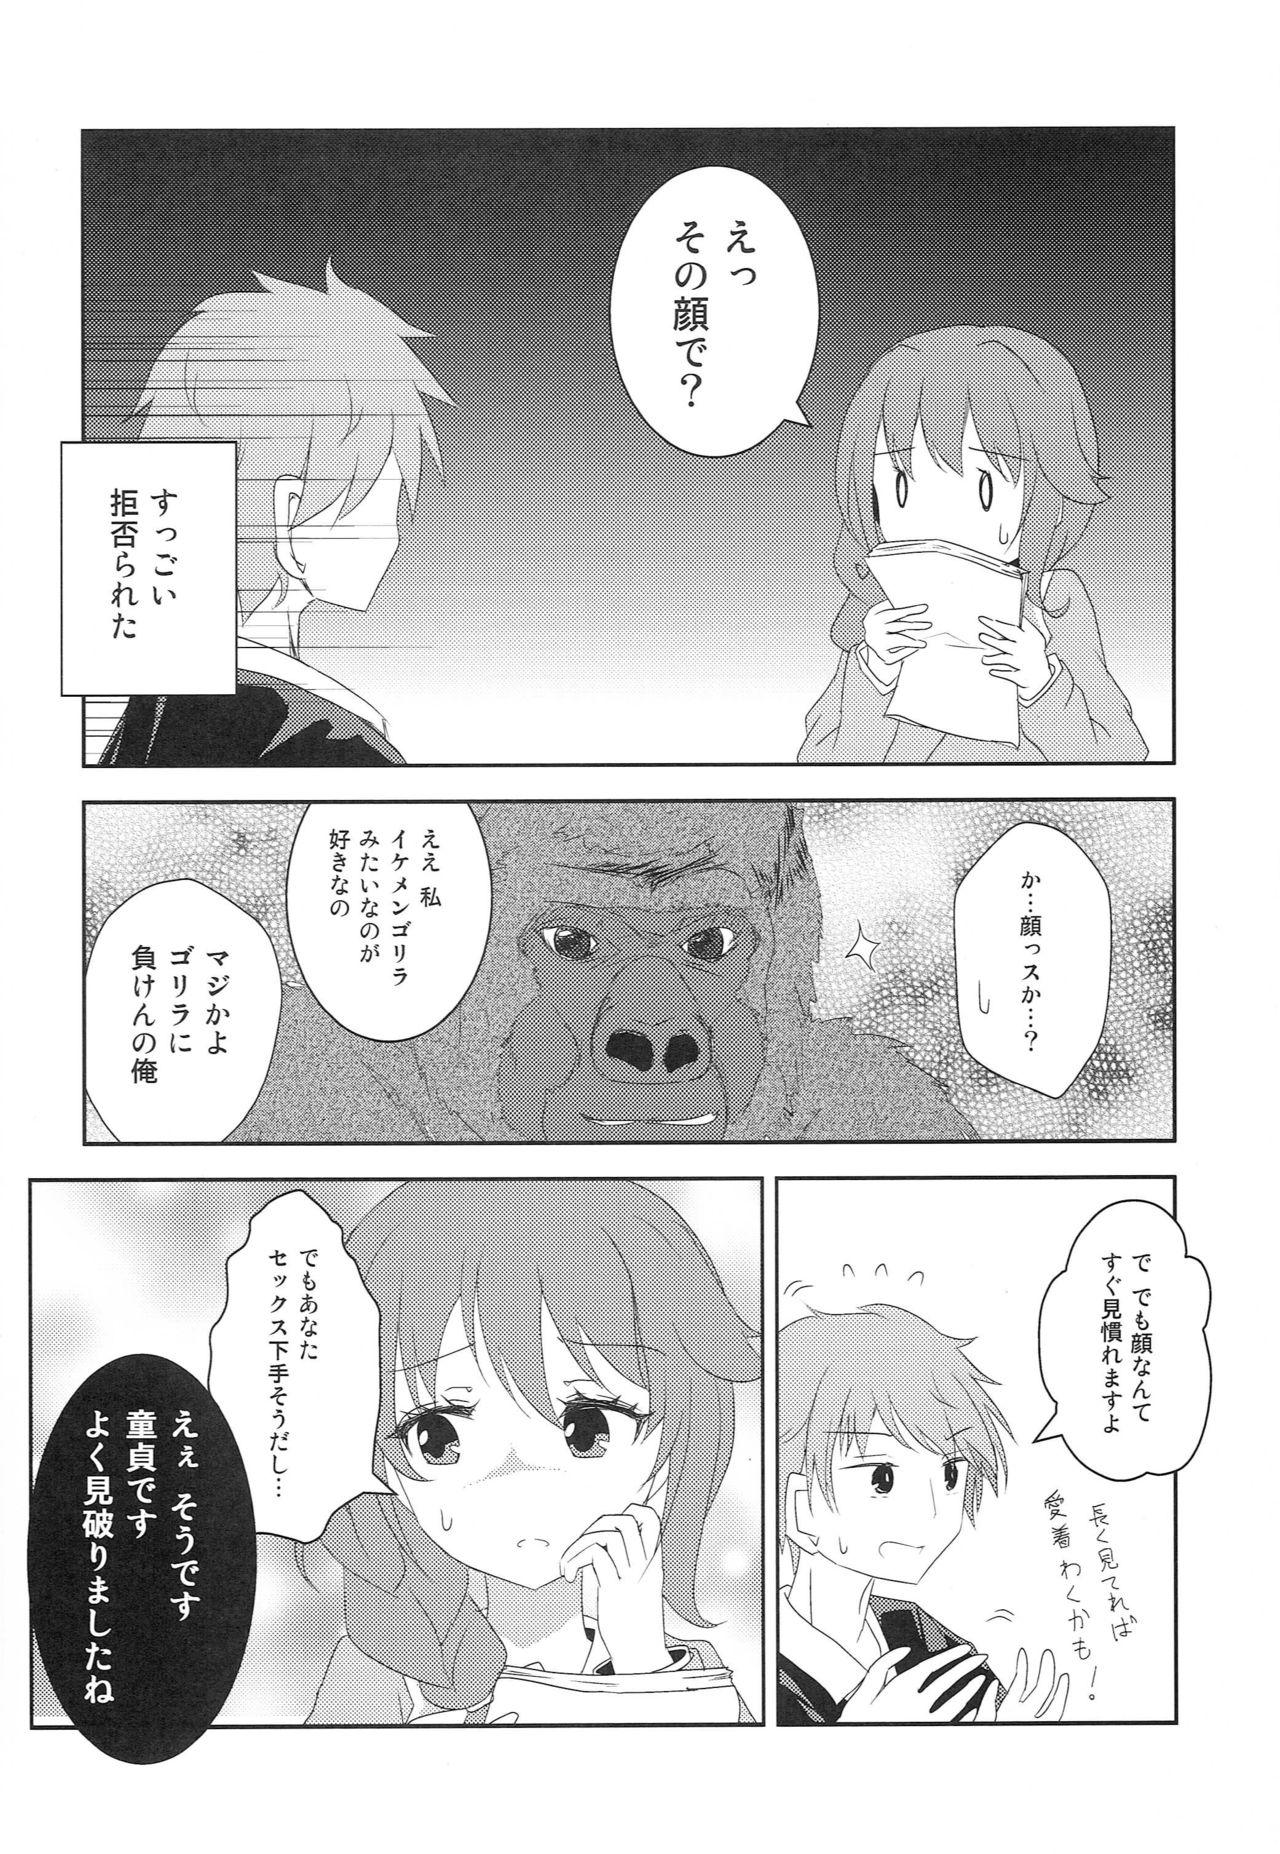 (CINDERELLA FESTIV@L) [Ribbon Enikki+ (Mickeysmith)] Chihiro-san ni Kokuhaku Shitara, Idol-tachi ni Mawasaretanda ga. (THE IDOLM@STER CINDERELLA GIRLS) 2